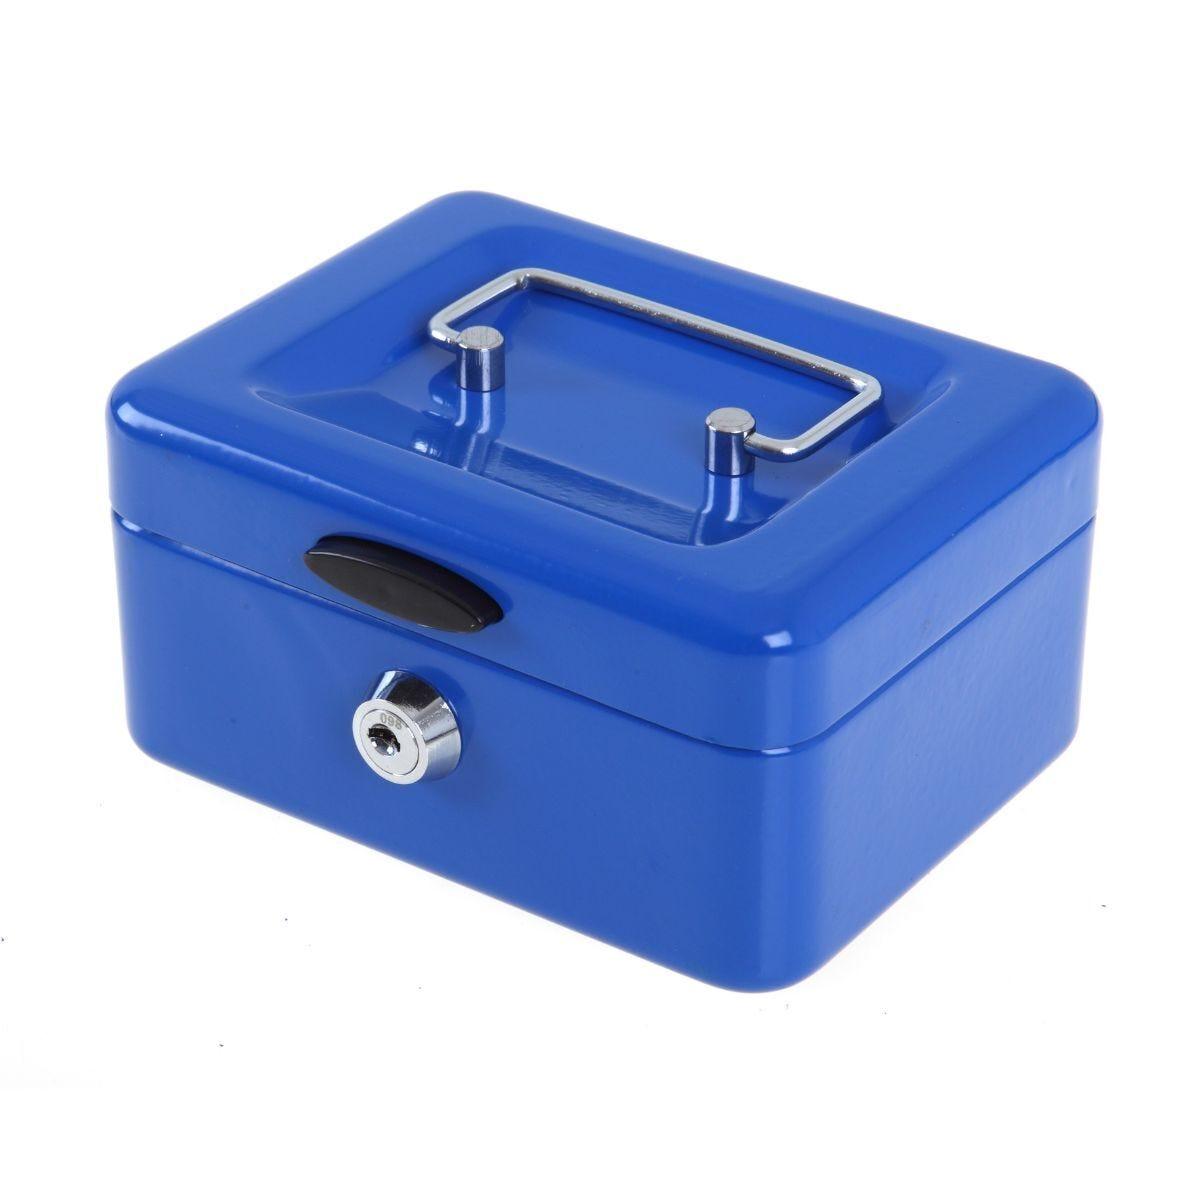 Ryman Button Release Cash Box H75xW150x110 Blue